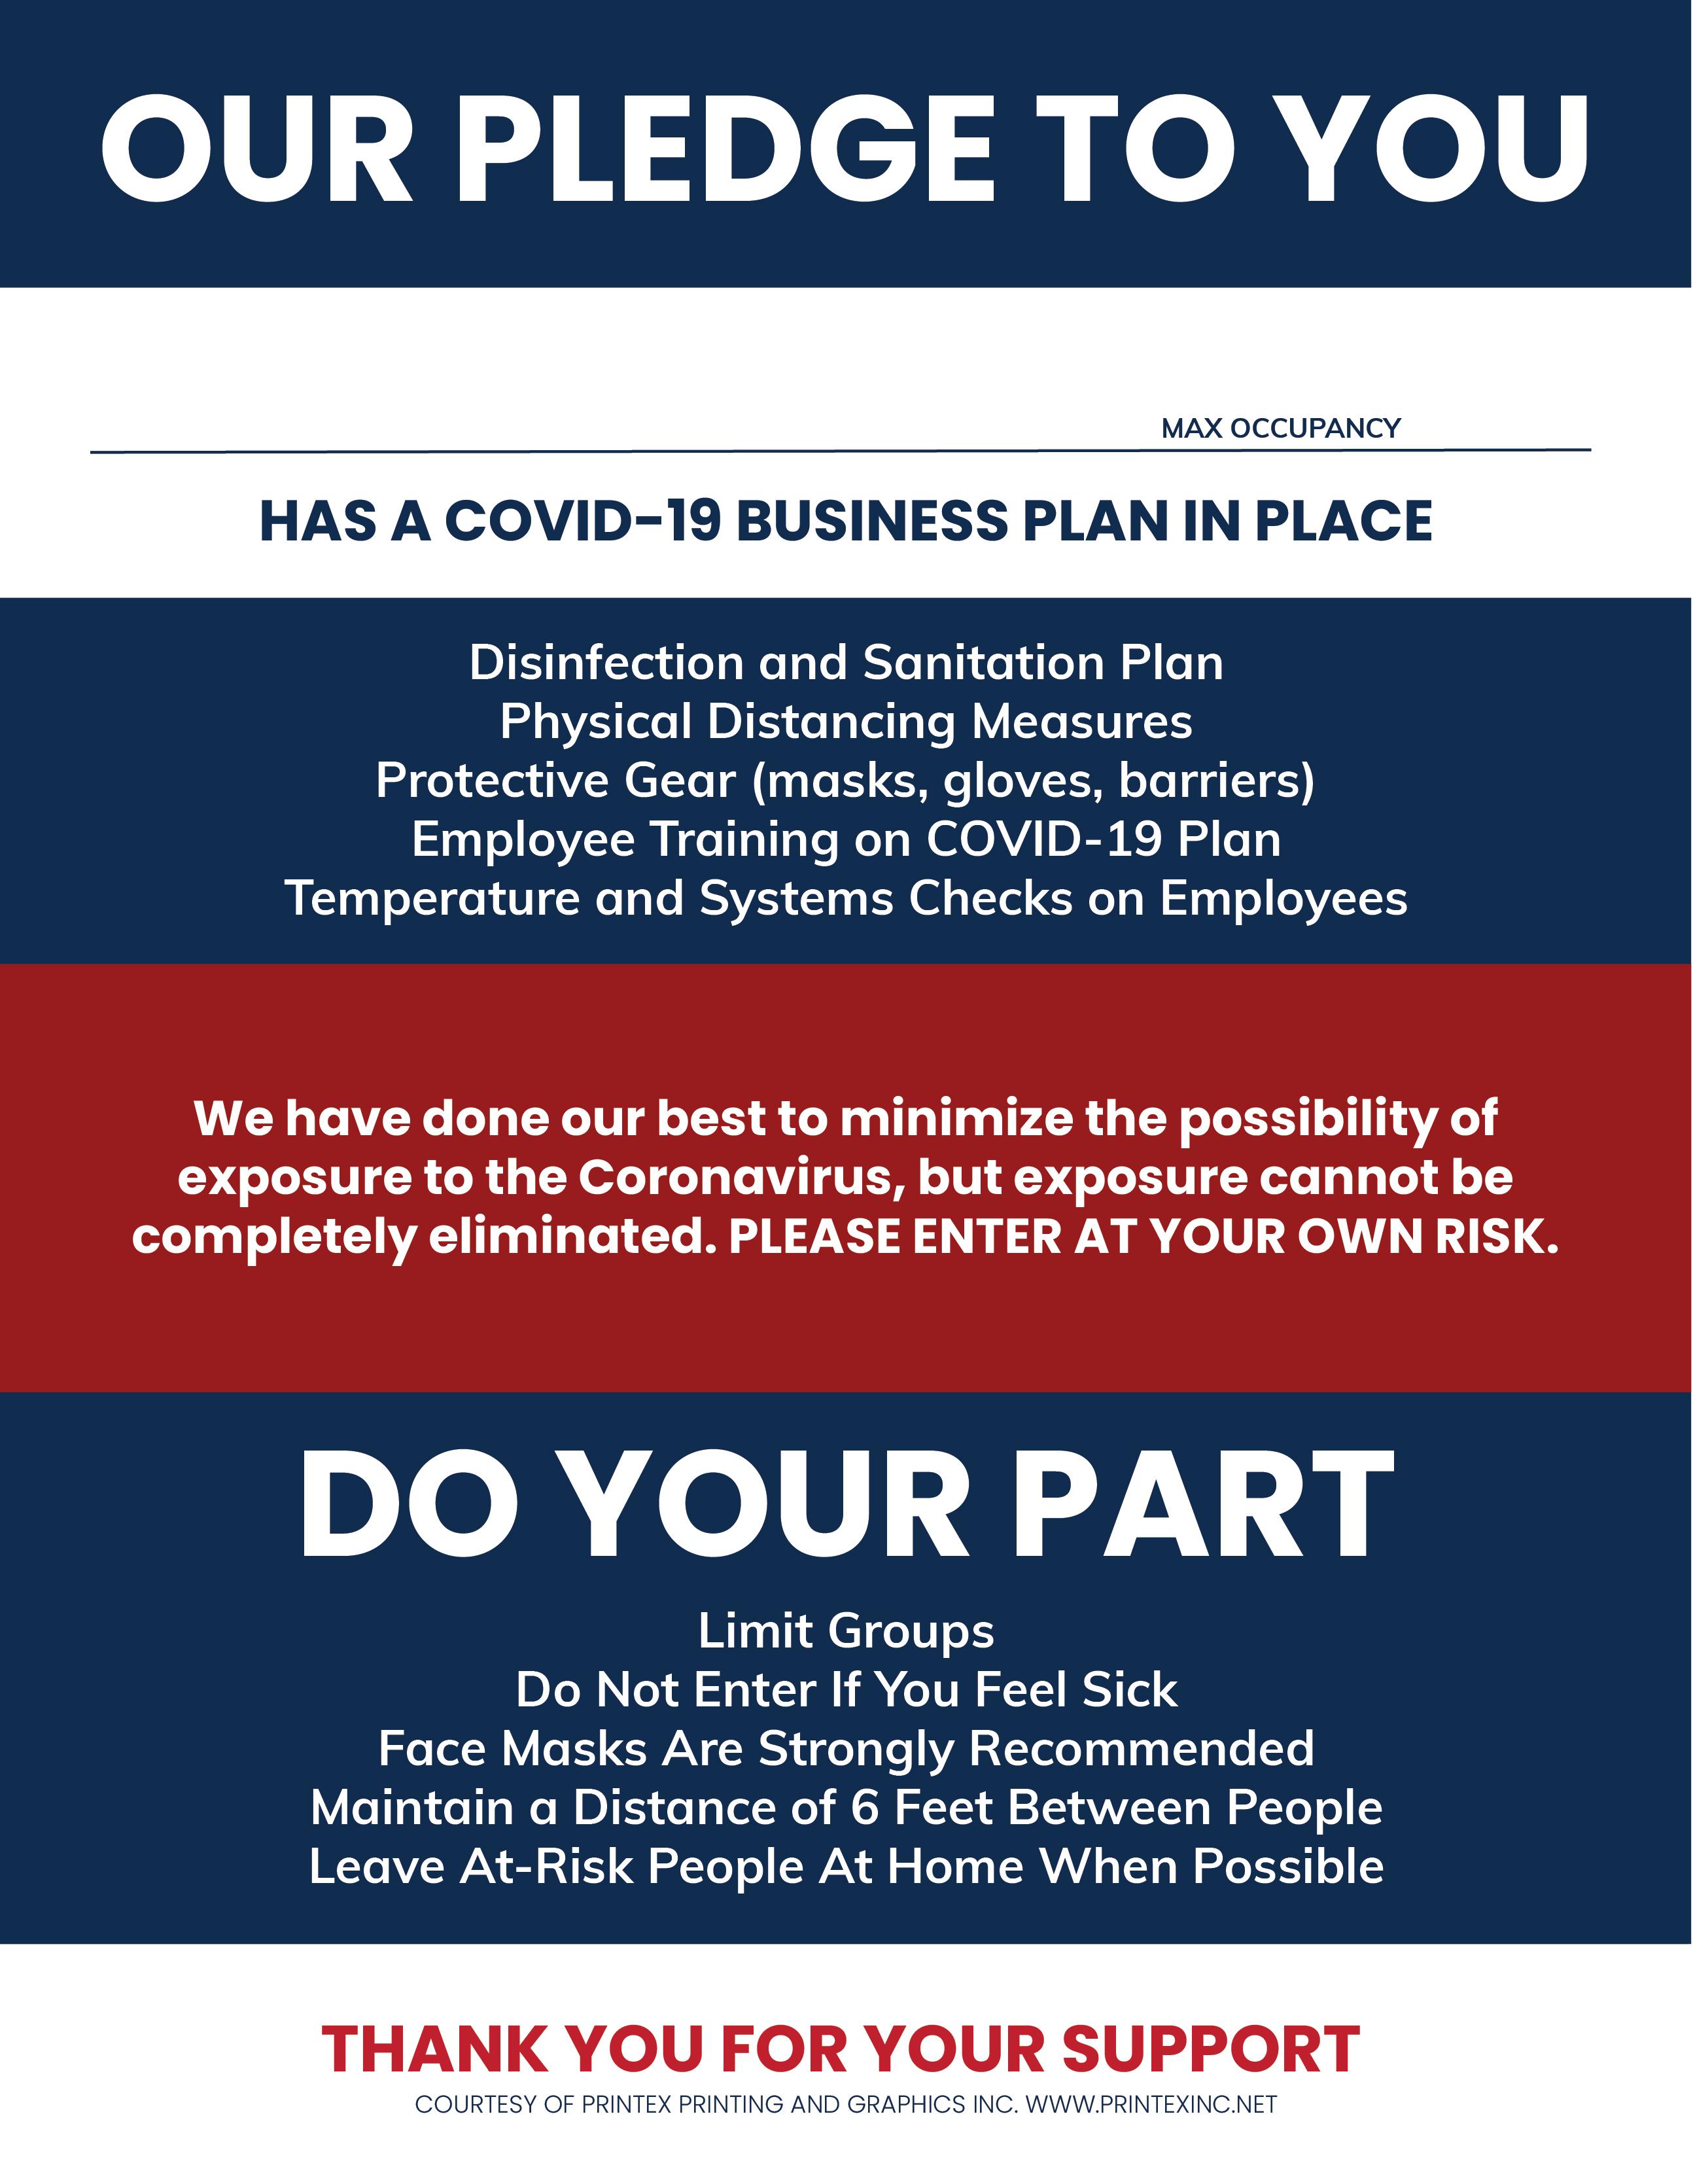 COVID-19 Business Plan Pledge Sign